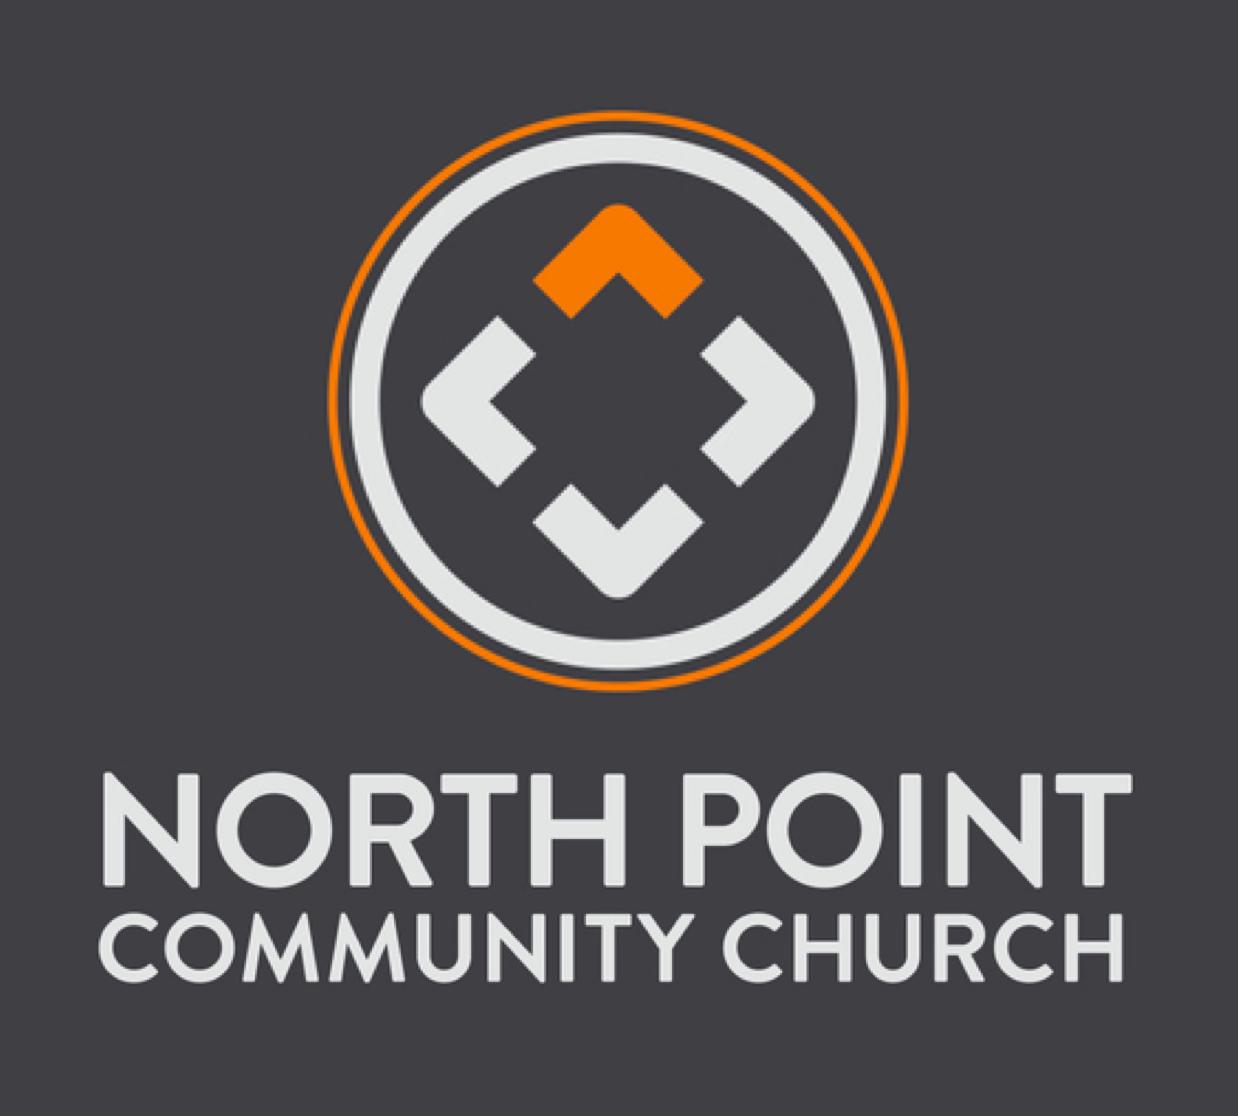 best-christian-churches-North-Point-Community-Church-logo